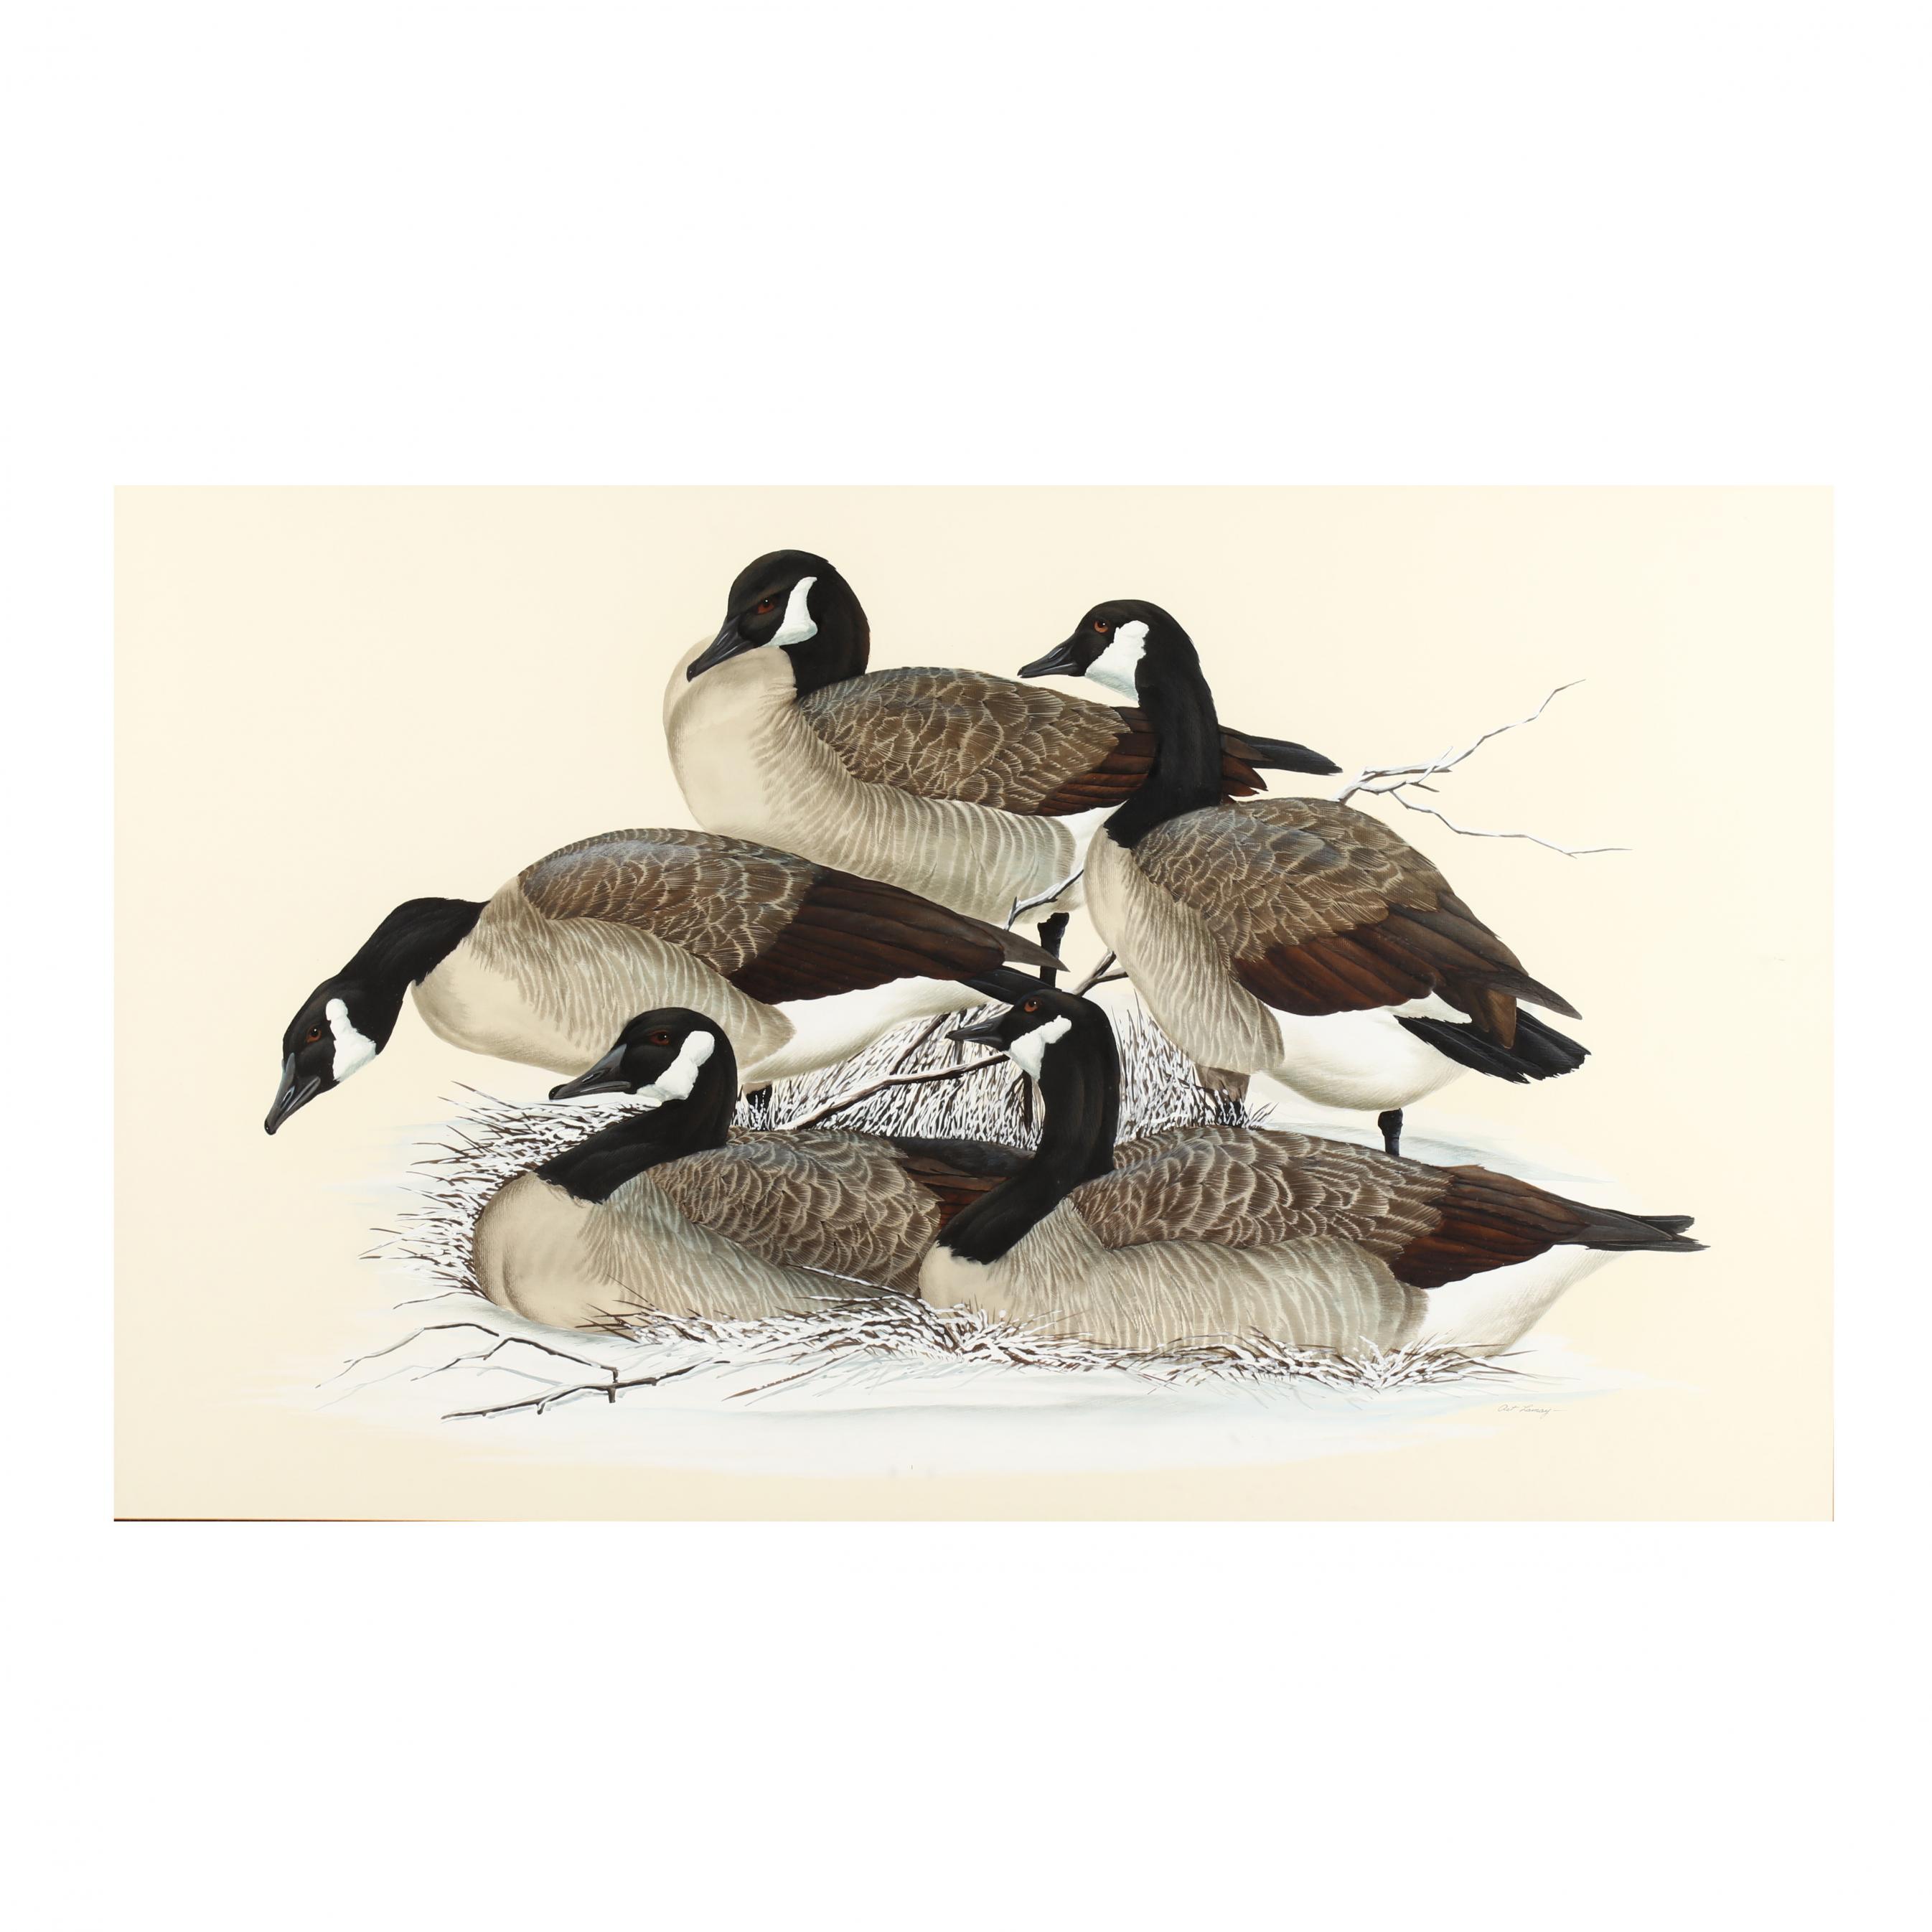 art-lamay-born-1938-large-watercolor-of-geese